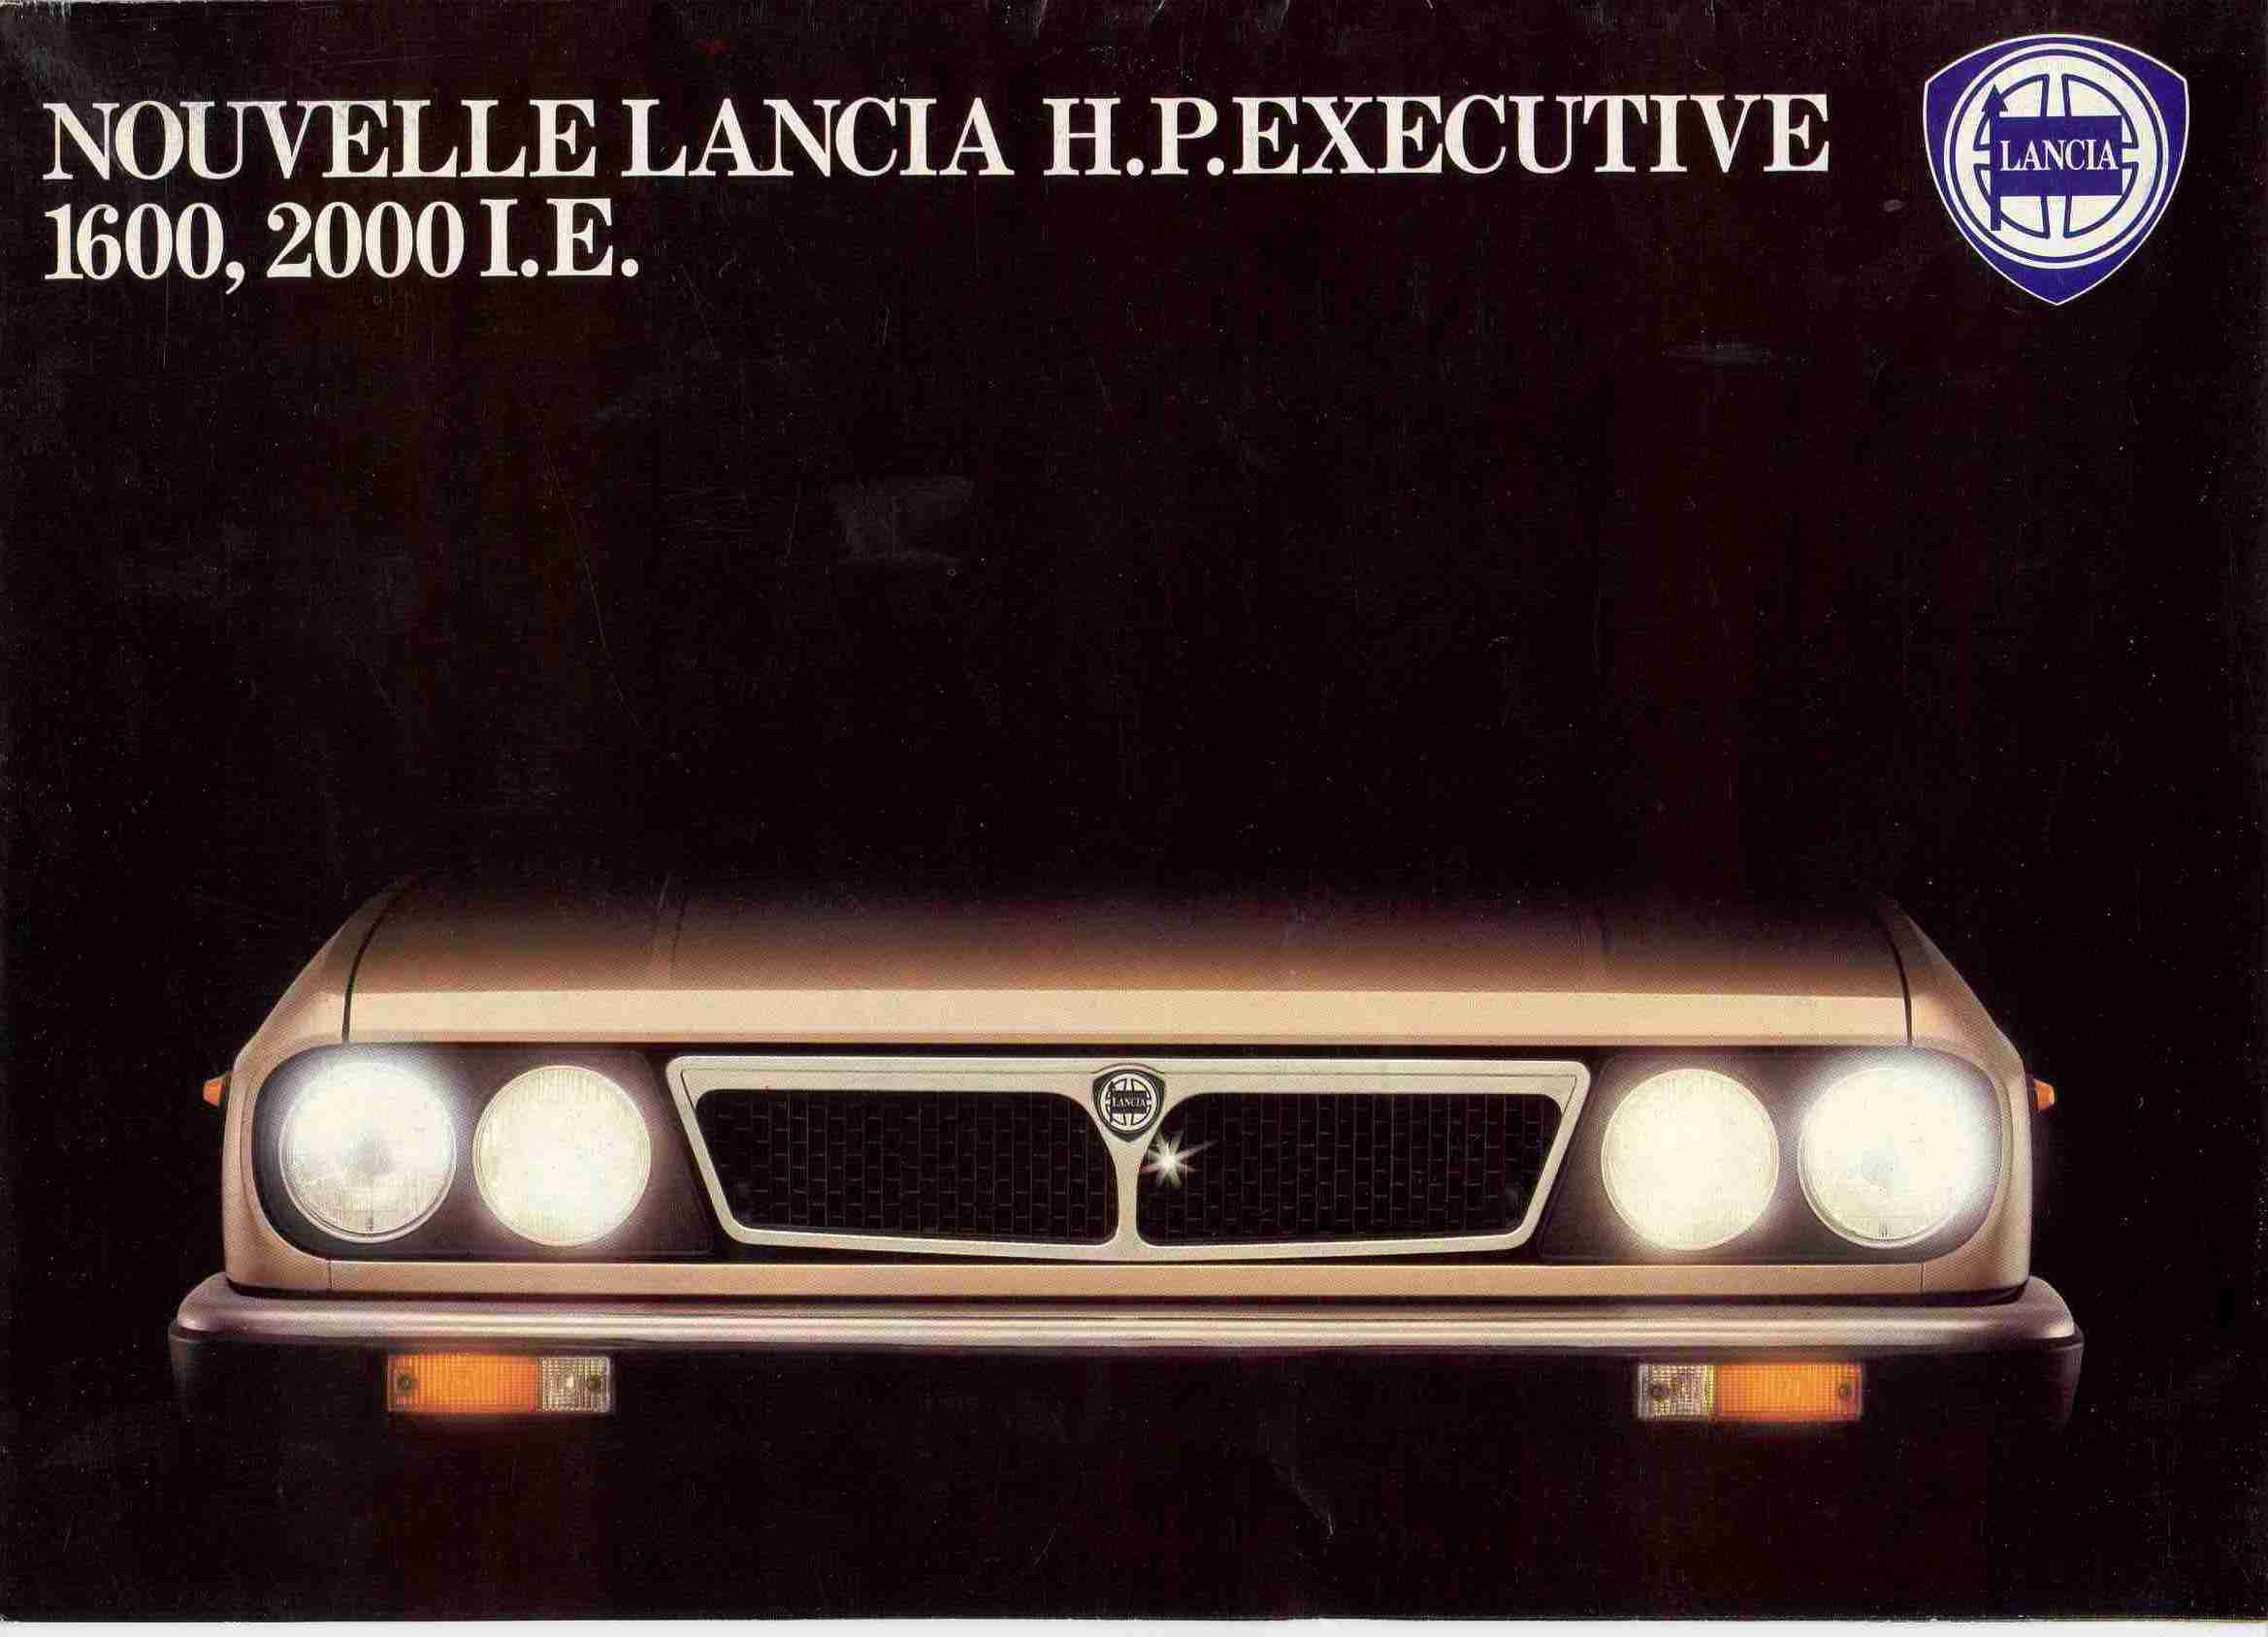 Lancia Beta Hp Executive (49 Images) - New HD Car Wallpaper